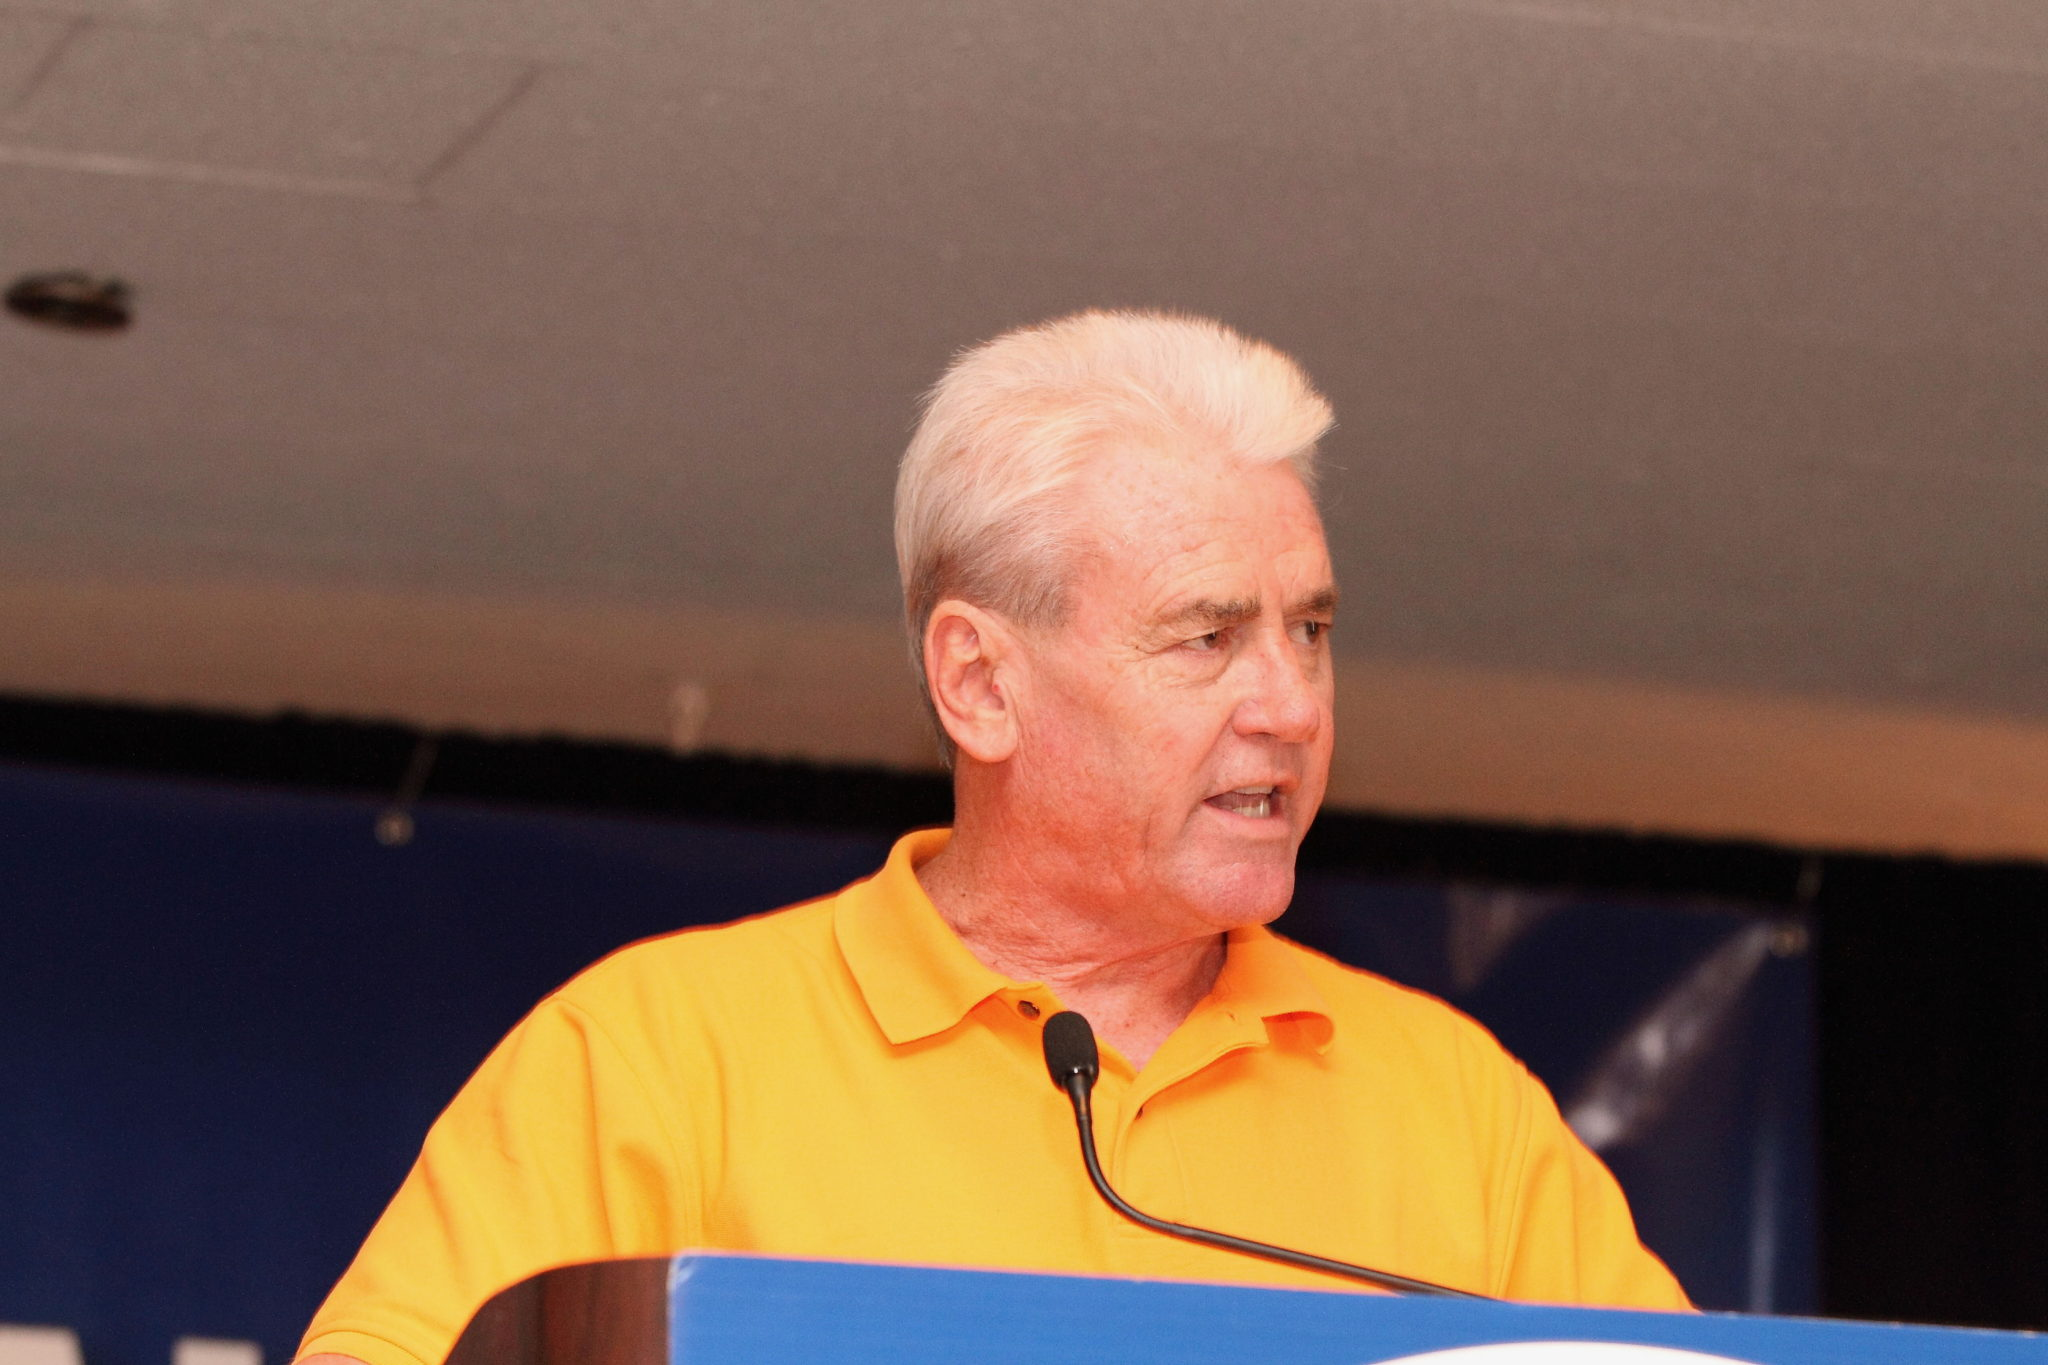 Terry O'Sullivan, LIUNA President